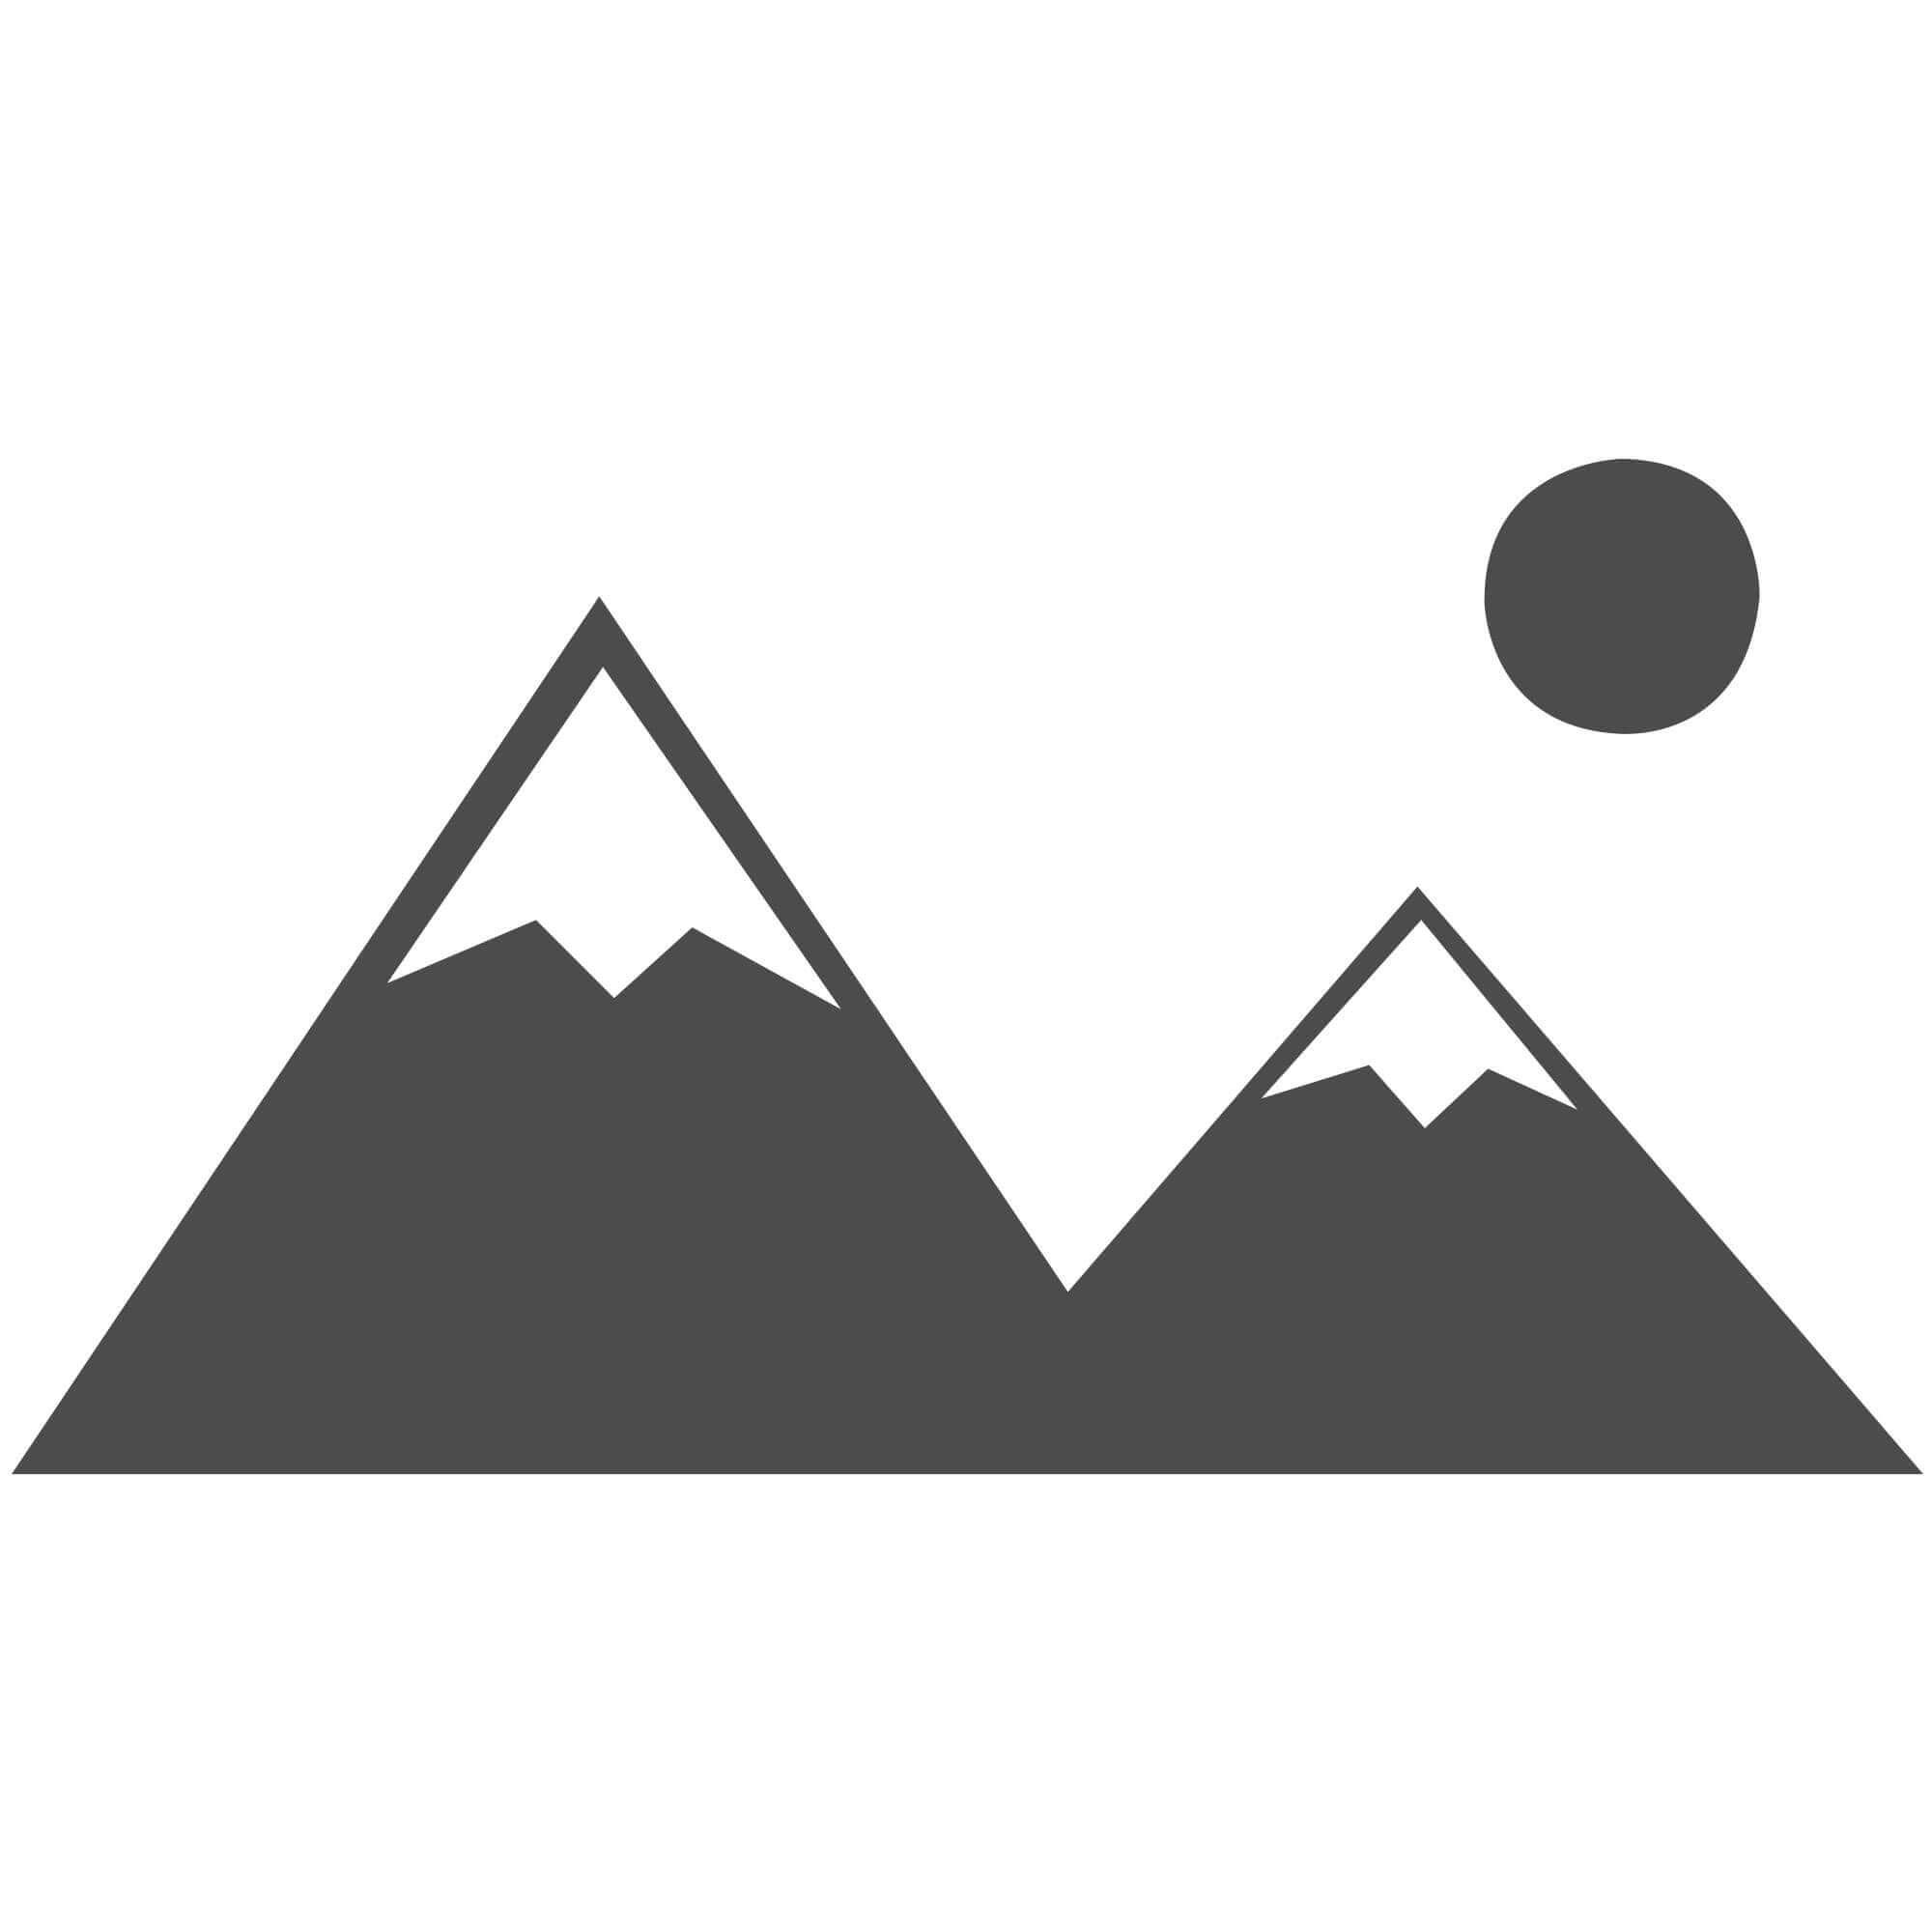 Griot Stripe Rug - Adungu - KI800 Poppy Seed